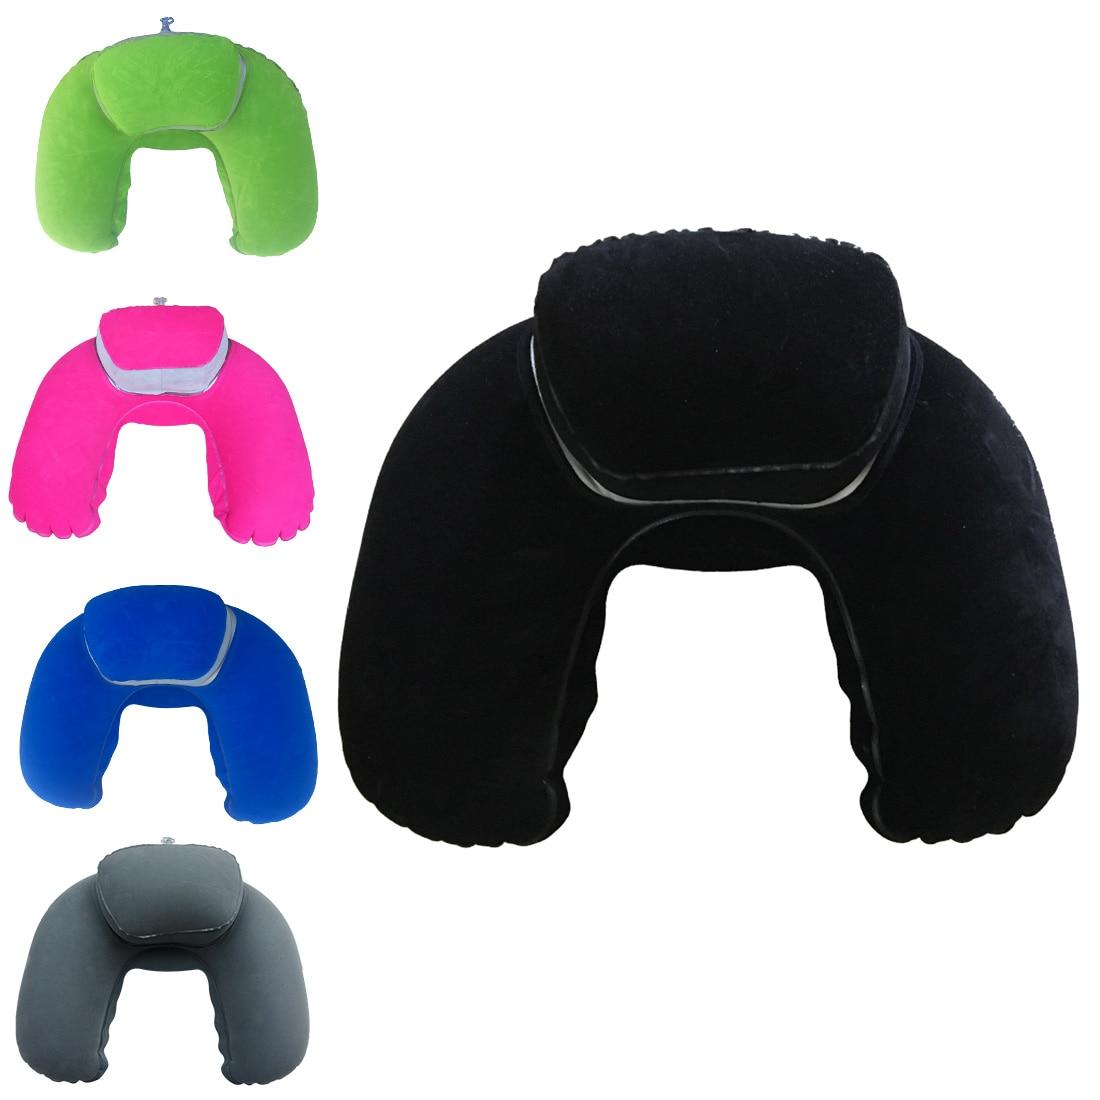 Travel Pillow Neck Pillow U-car Breathable Flight Inflatable Pillow Neck Support Headrest Cushion Soft Care Cushion Pillowcase